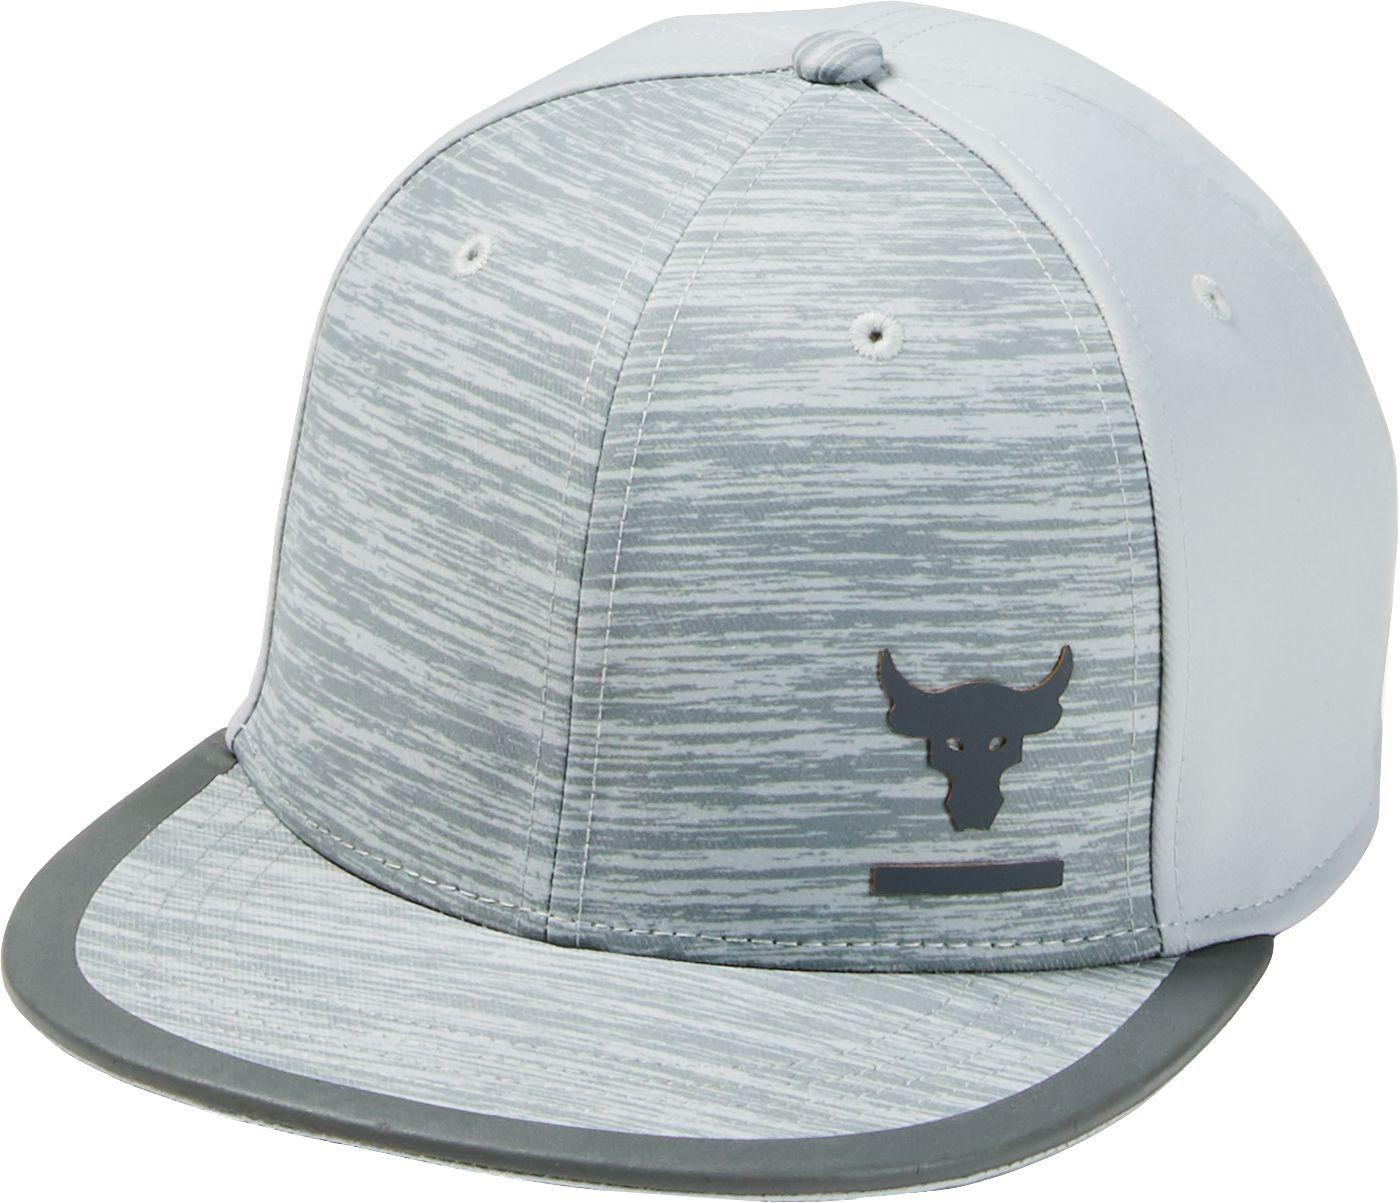 Under Armour Men's Project Rock Flat Brim Snapback Hat